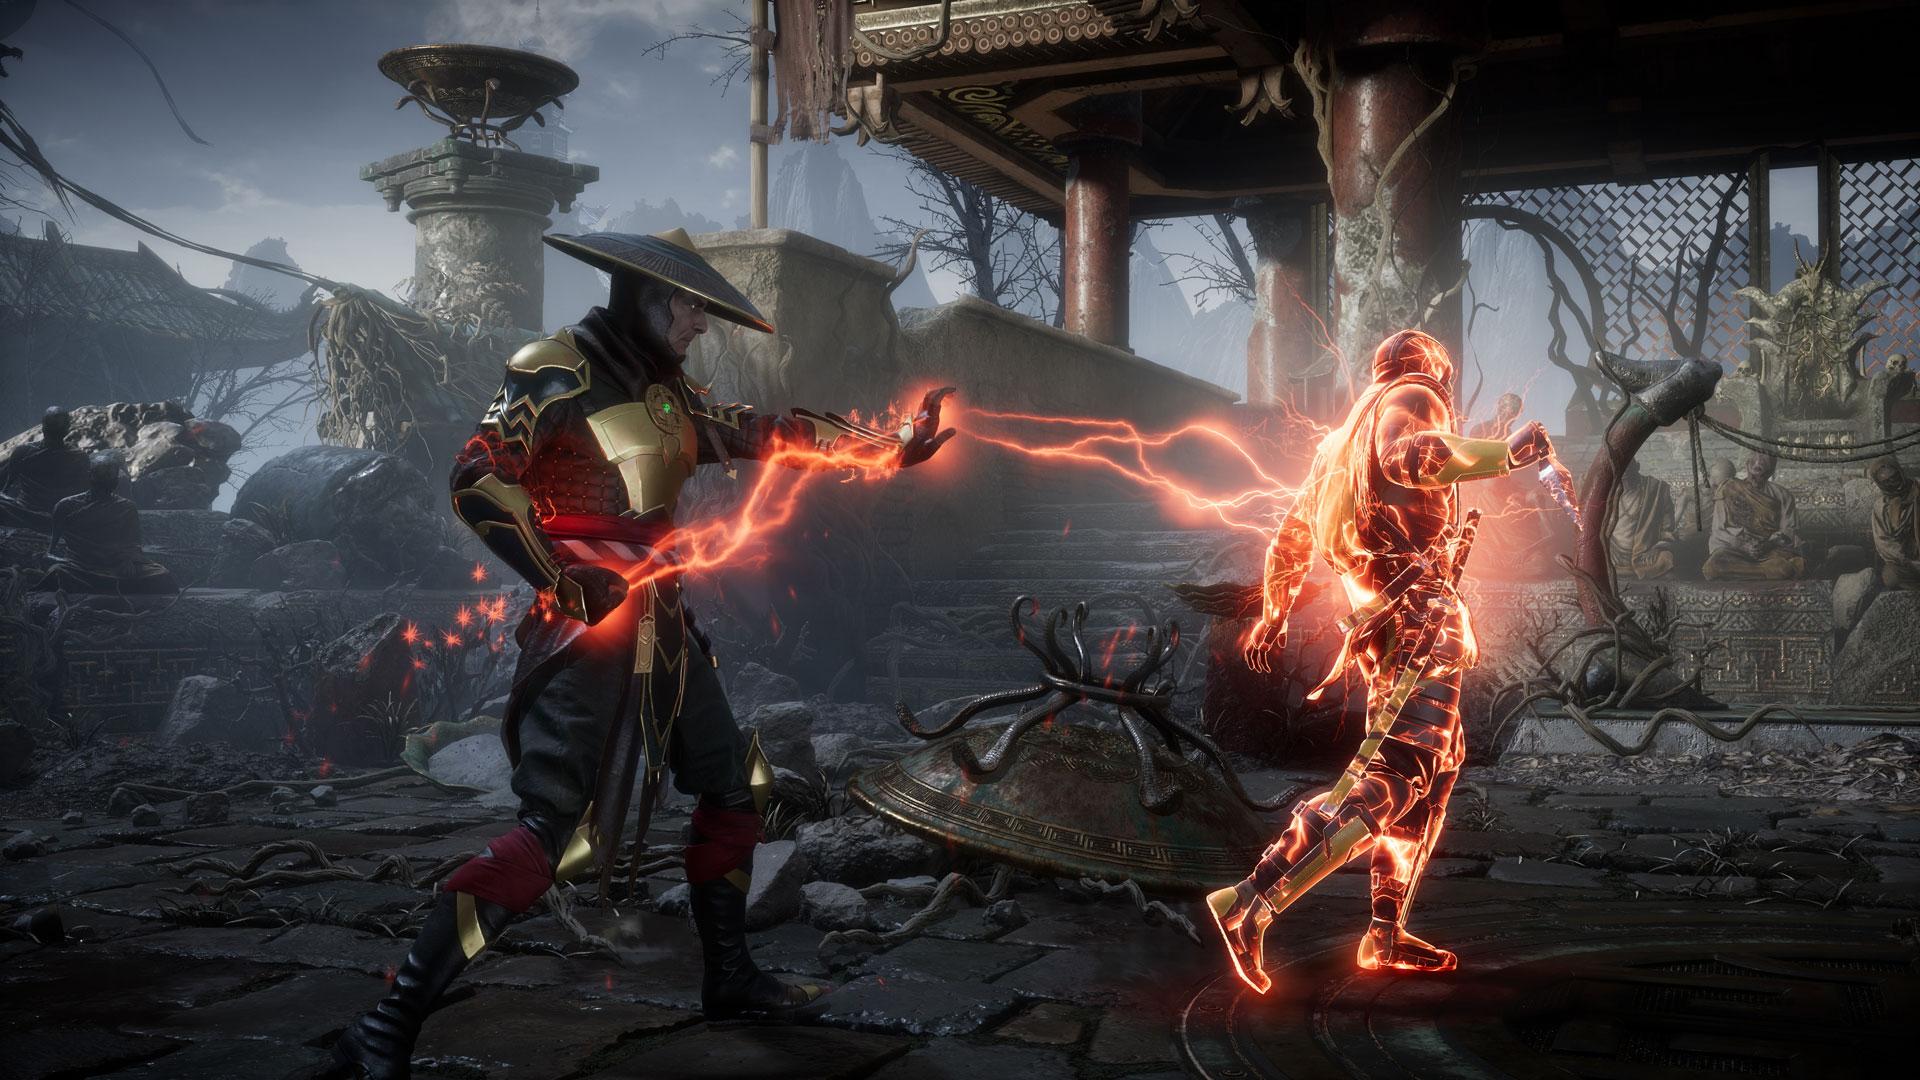 Play Mortal Kombat 11